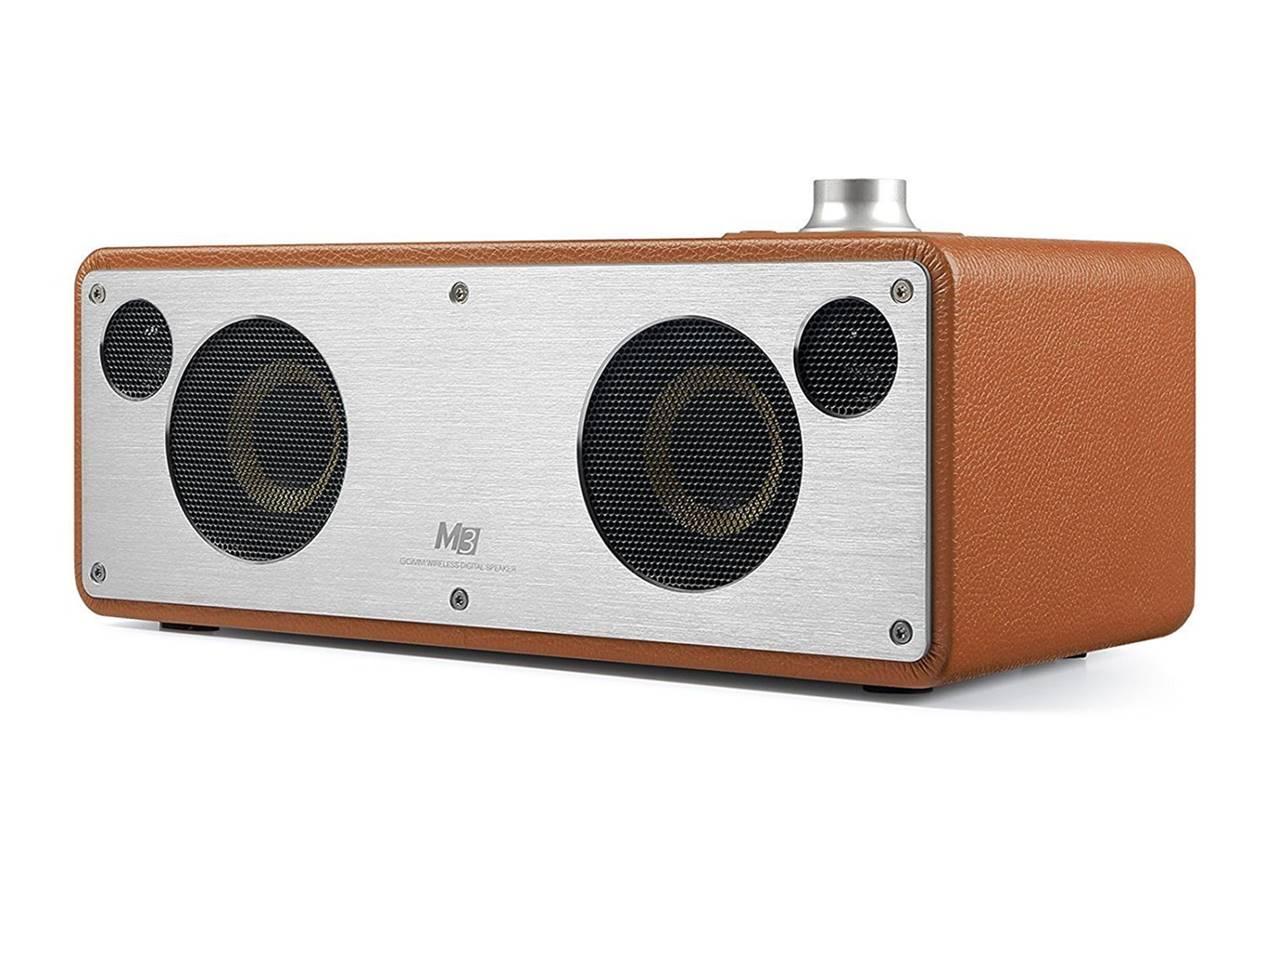 GGMM Smart Multi-Room Speaker System